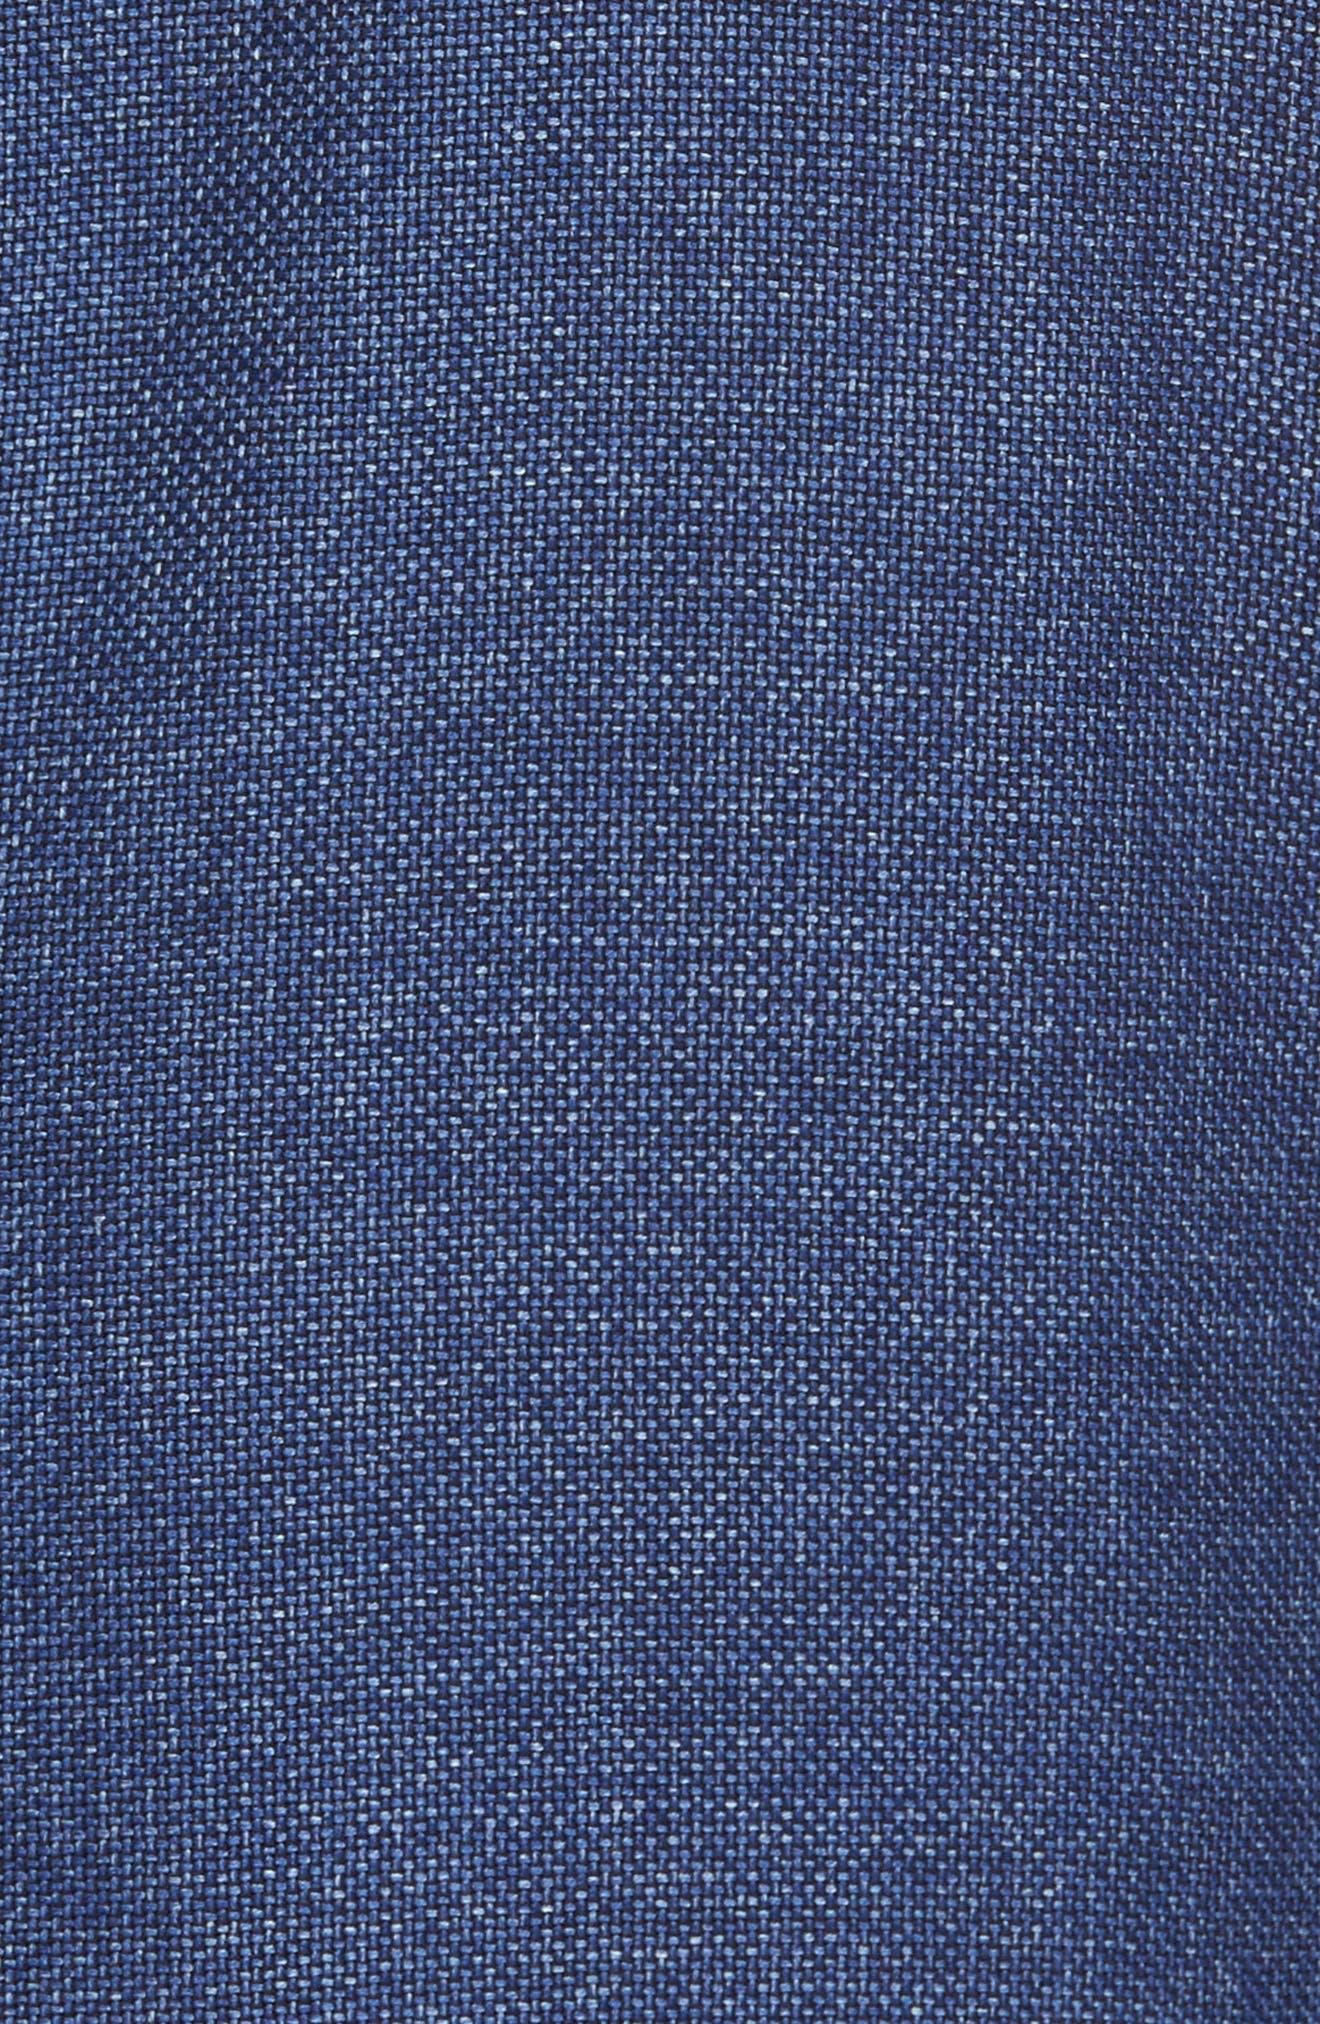 Trim Fit Wool Blazer,                             Alternate thumbnail 6, color,                             420